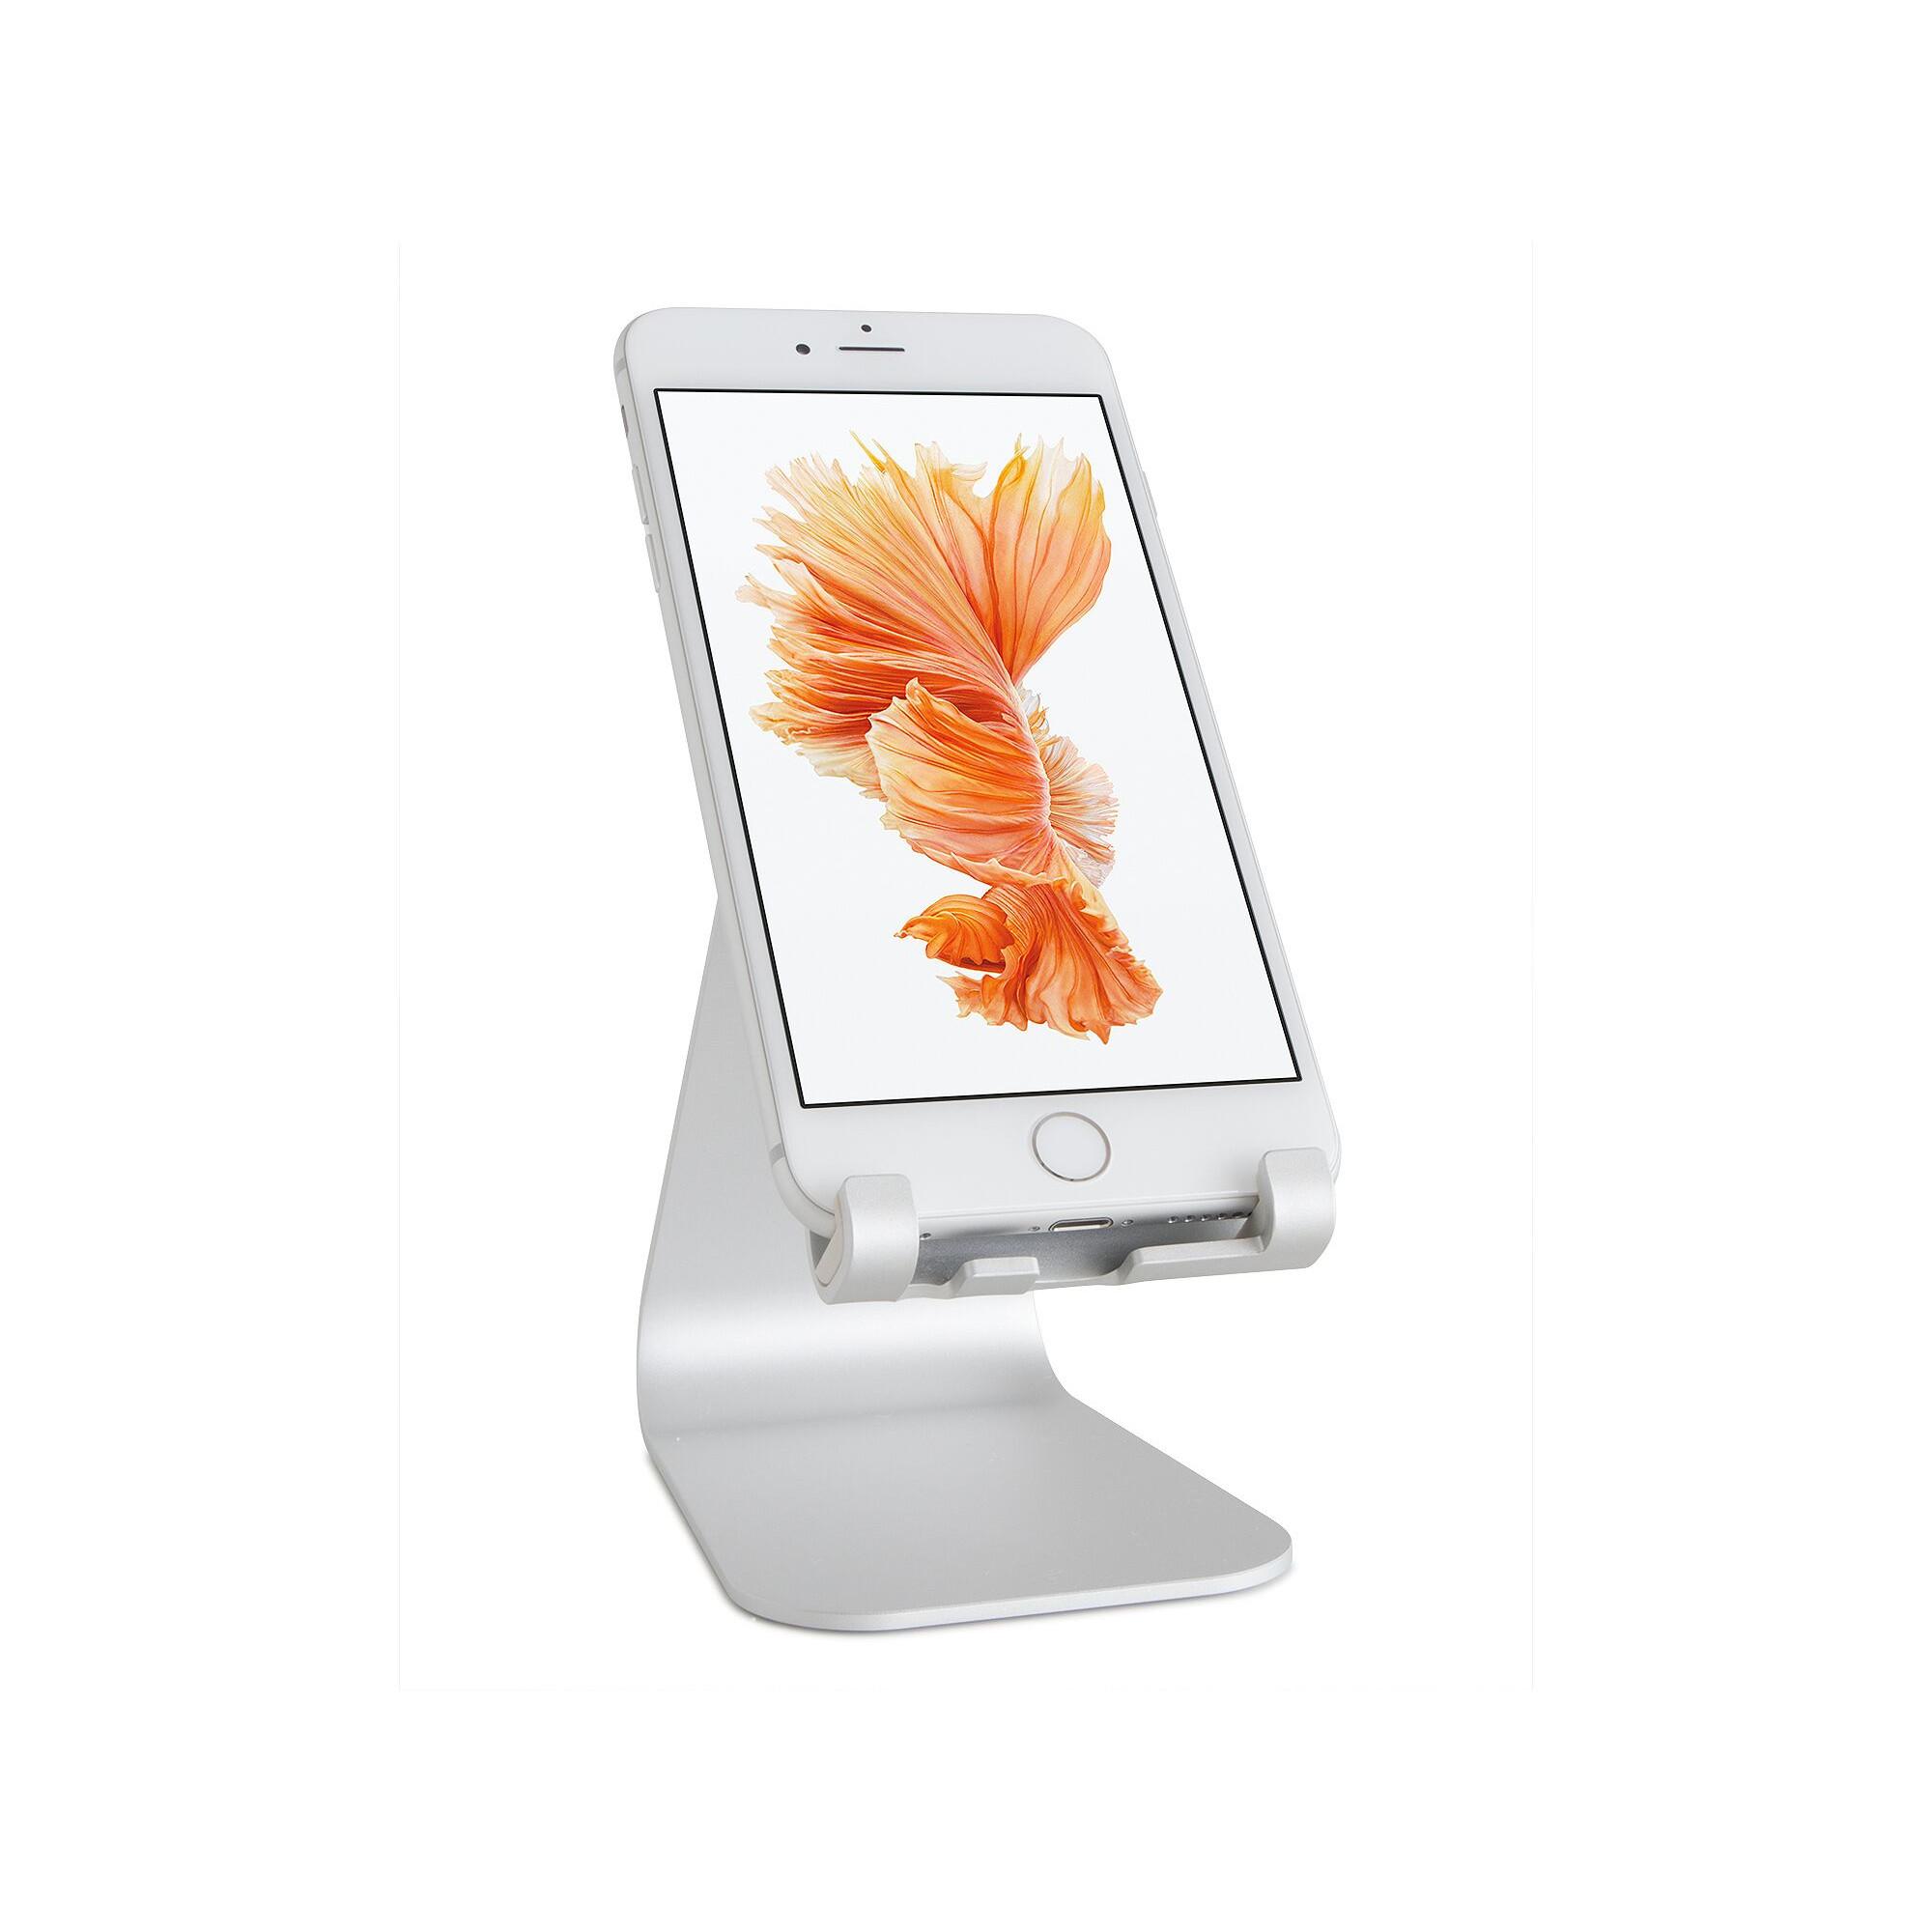 iPhone/iPad Mini Stand mStand | Silver